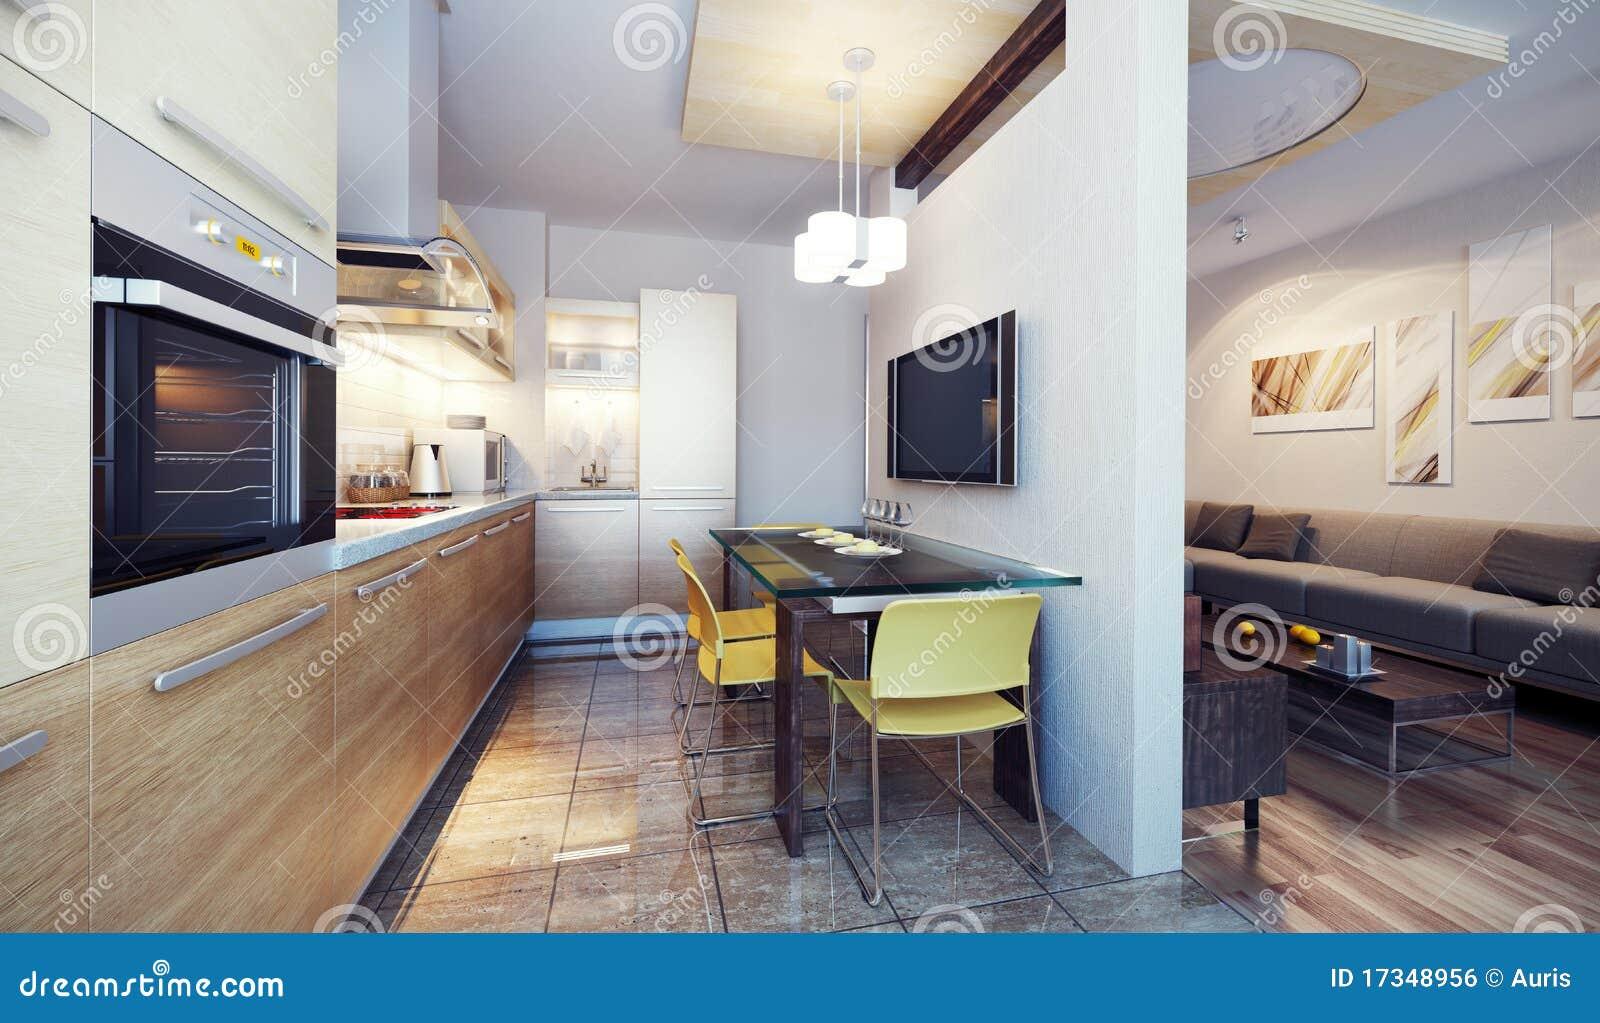 Modern kitchen interior 3d render royalty free stock image for Rendering 3d gratis